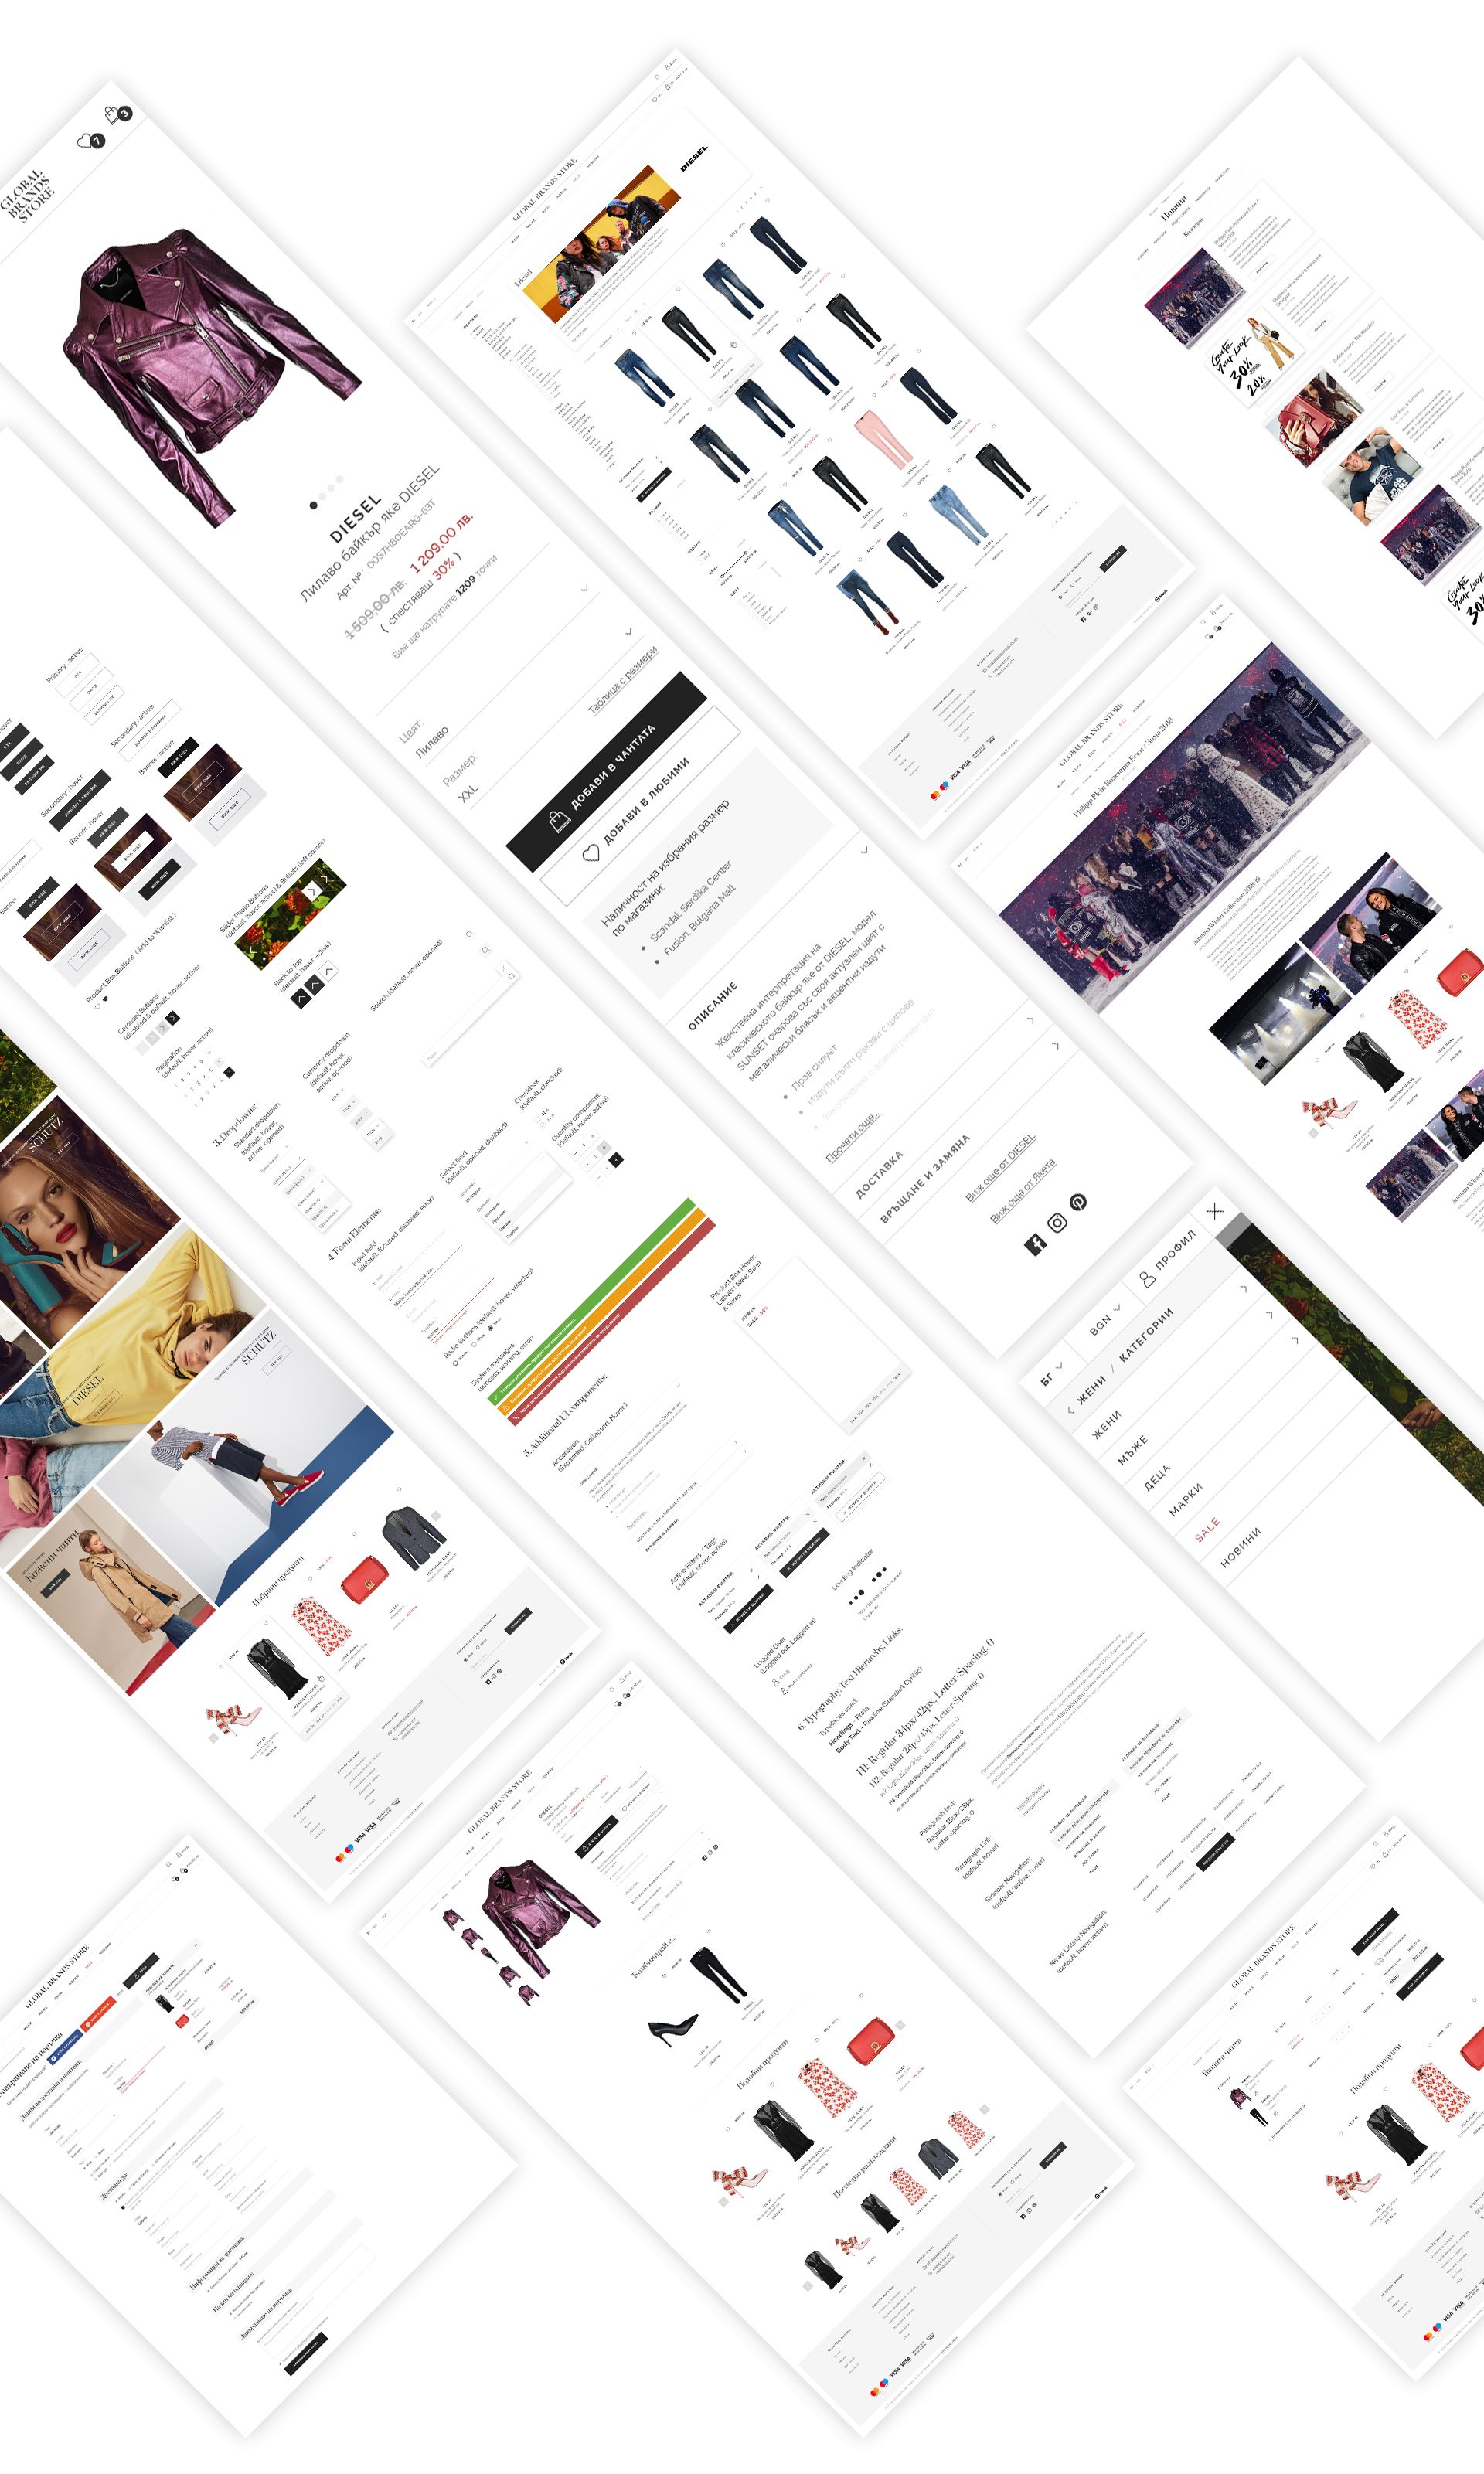 Global Brands - All Screens